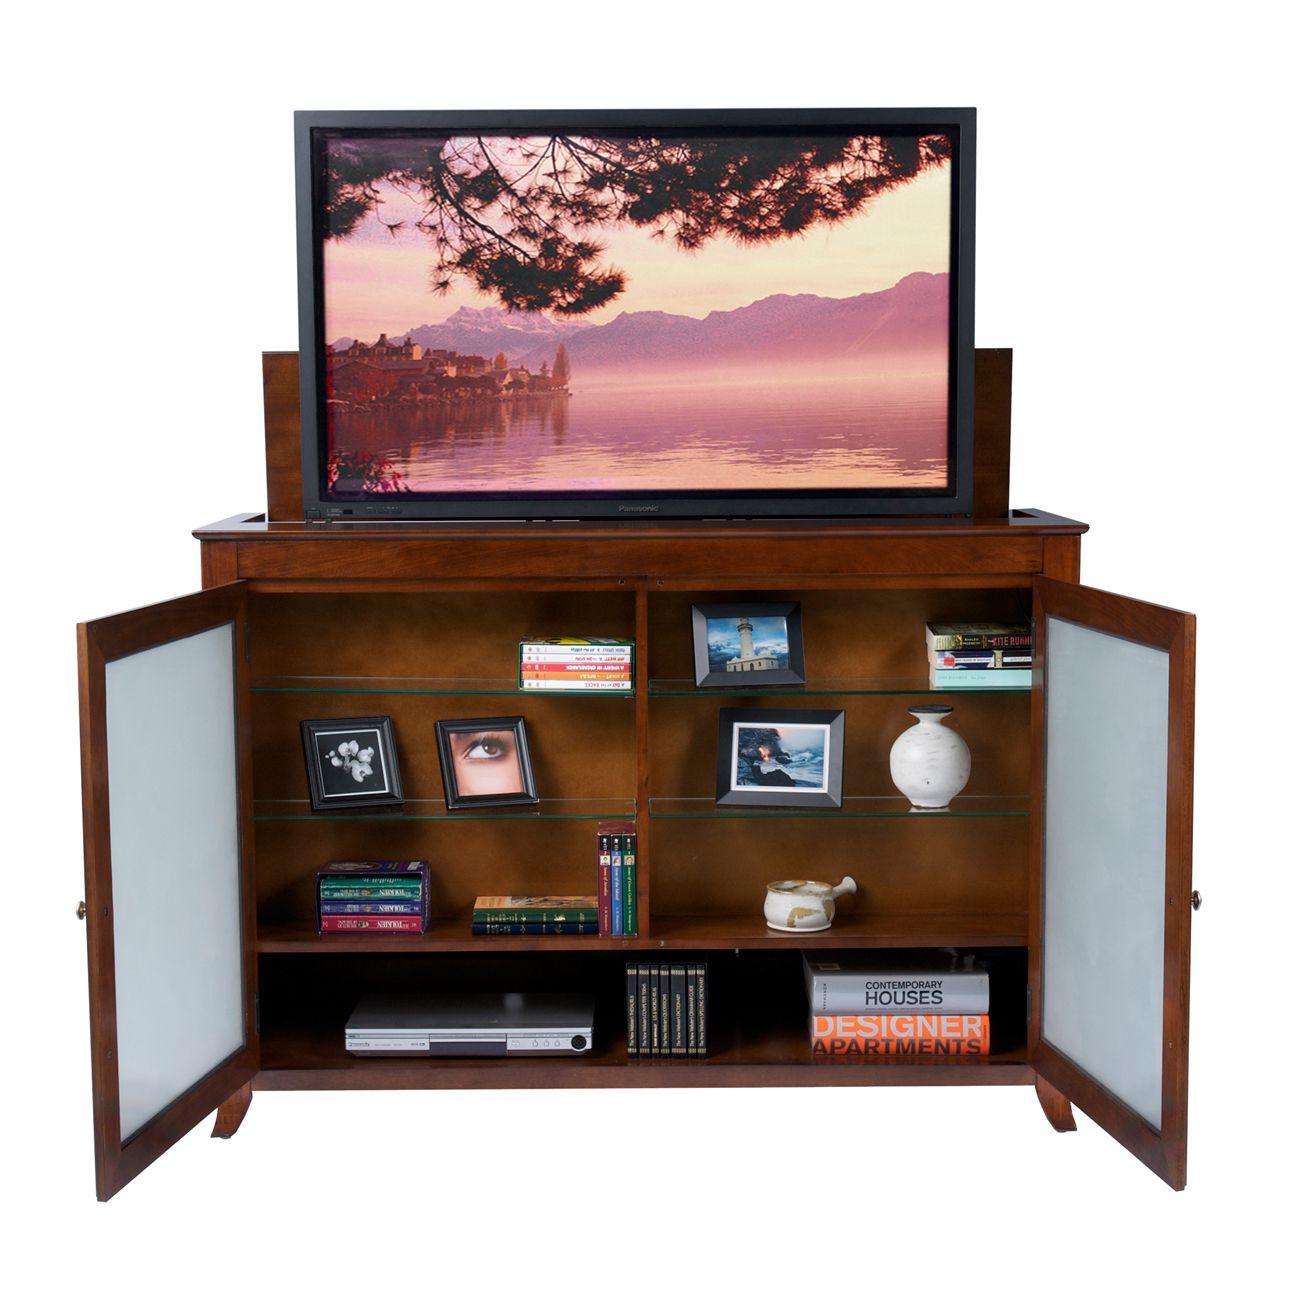 Brookside 70054 tv lift for 60 flat screen tvs